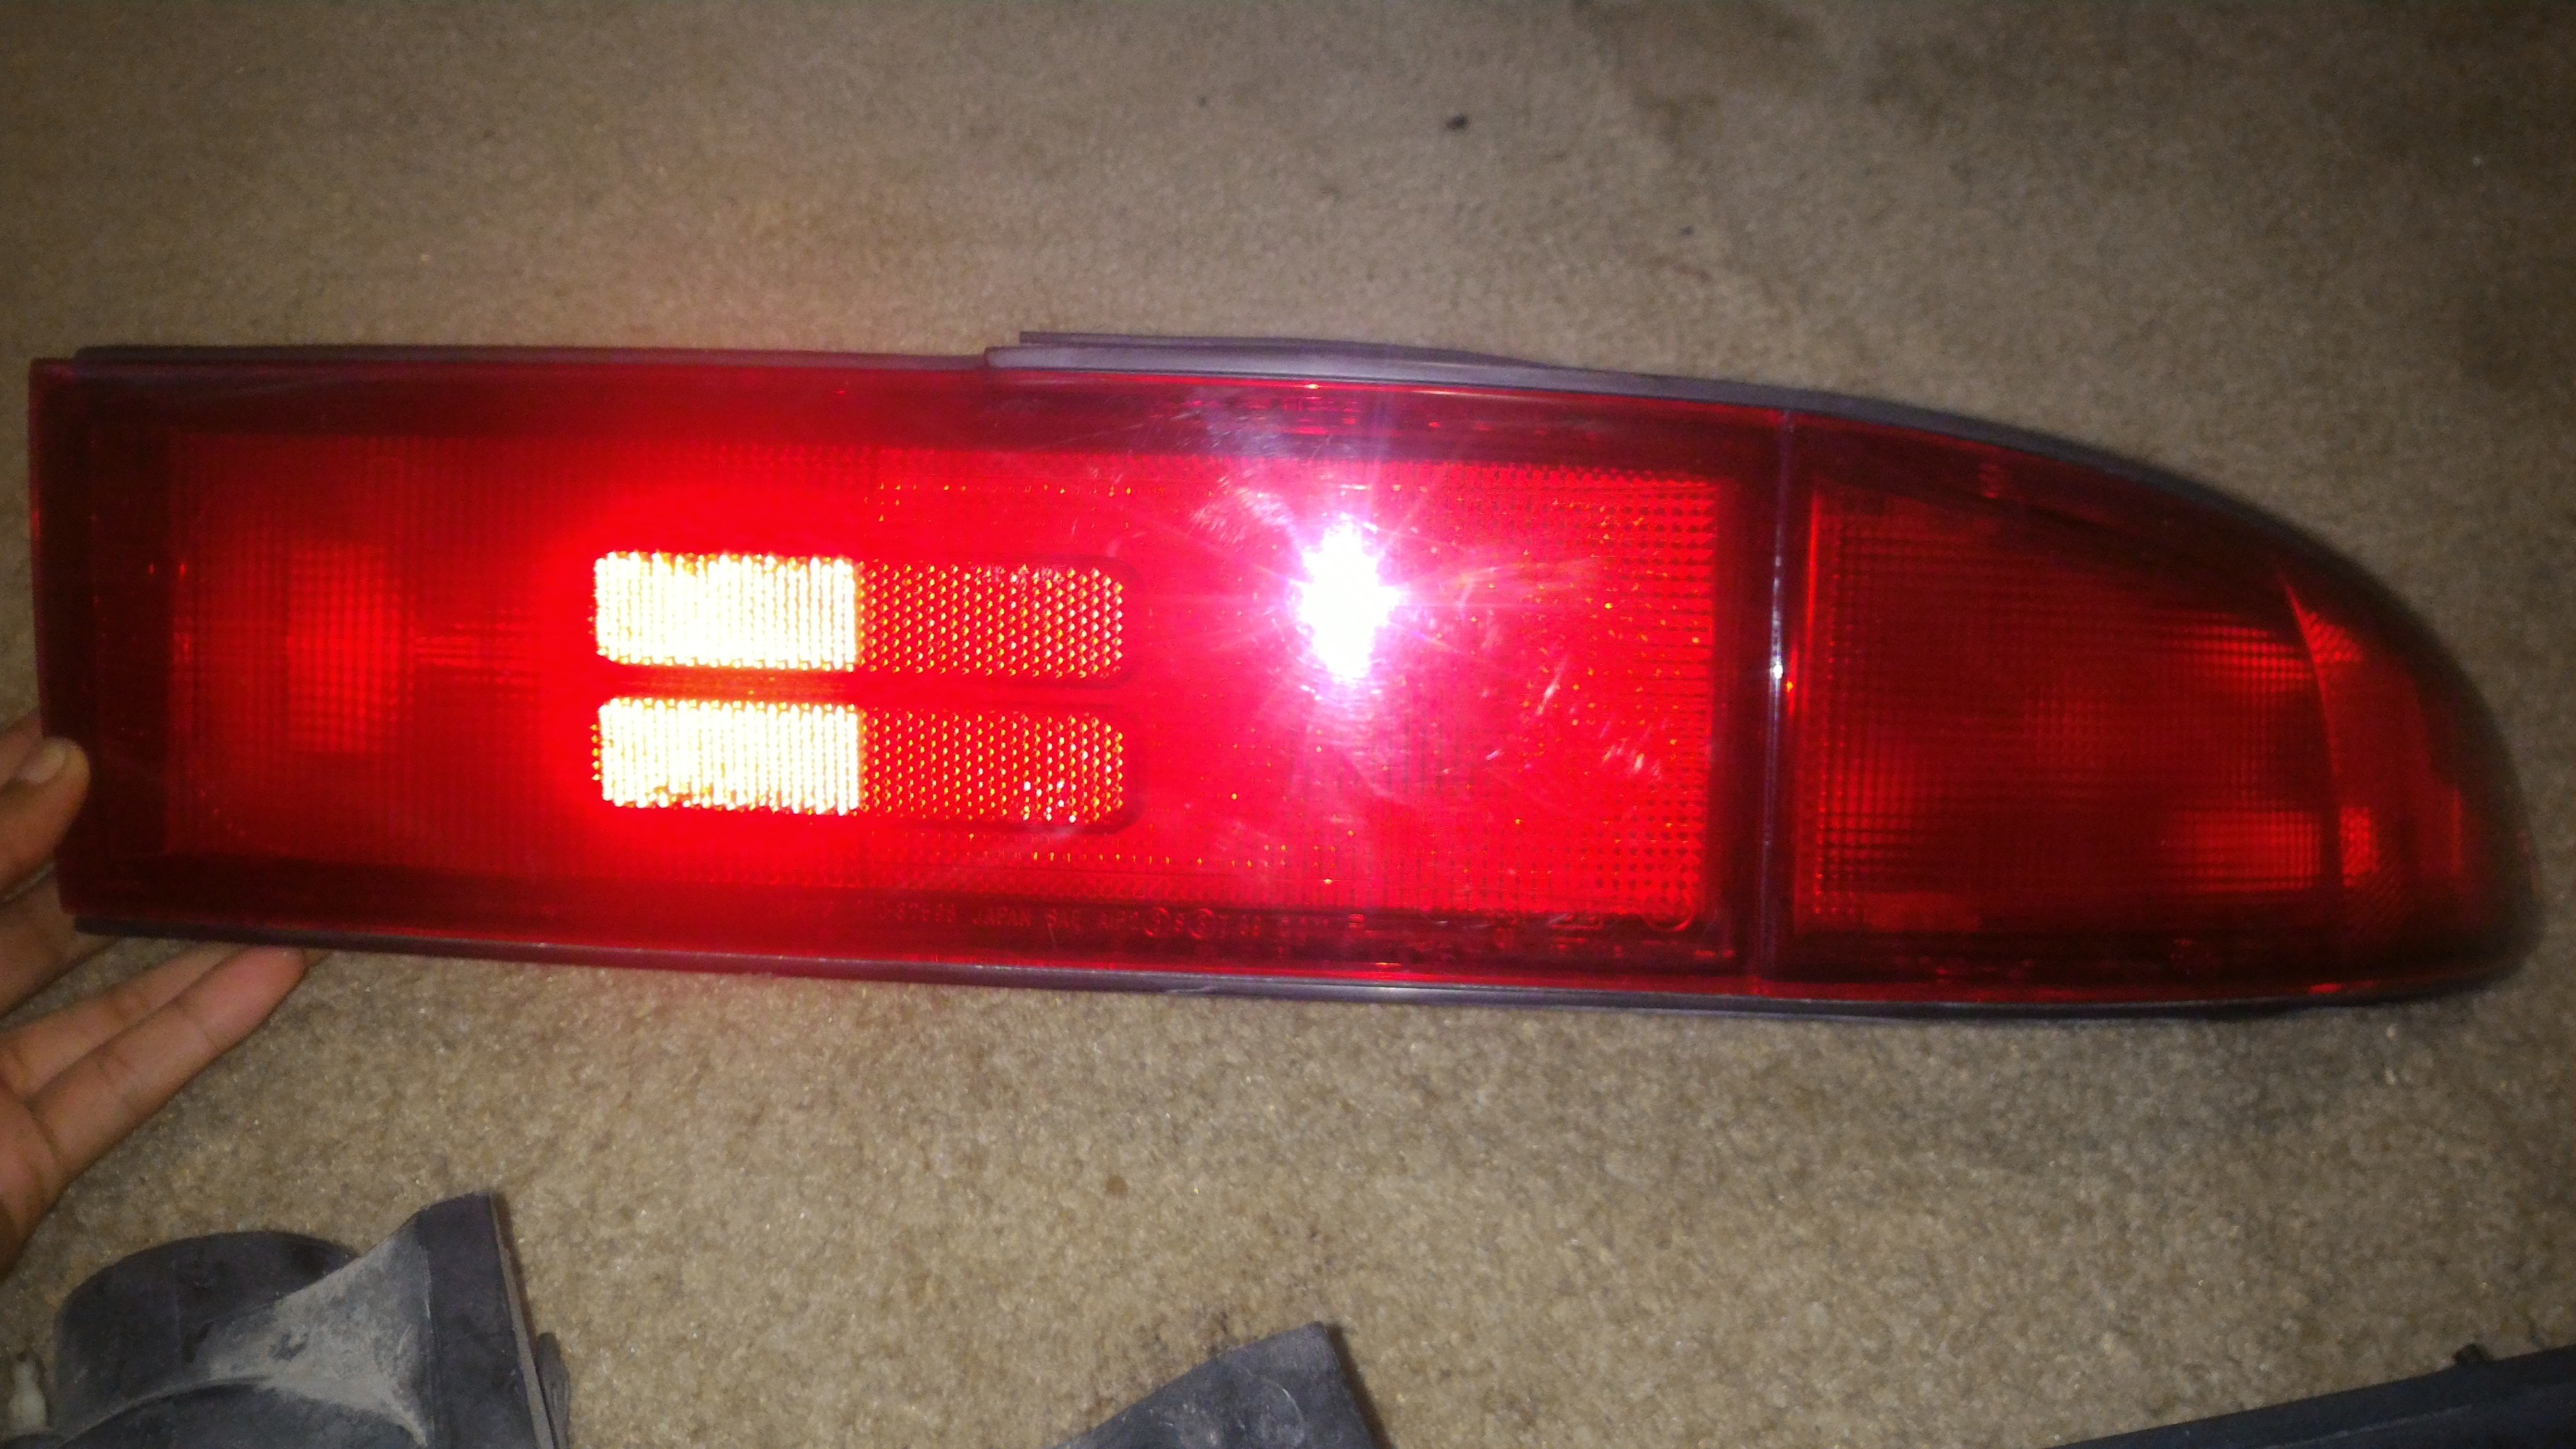 GTO rear garnish and tail lights.-p_20191001_150947.jpg